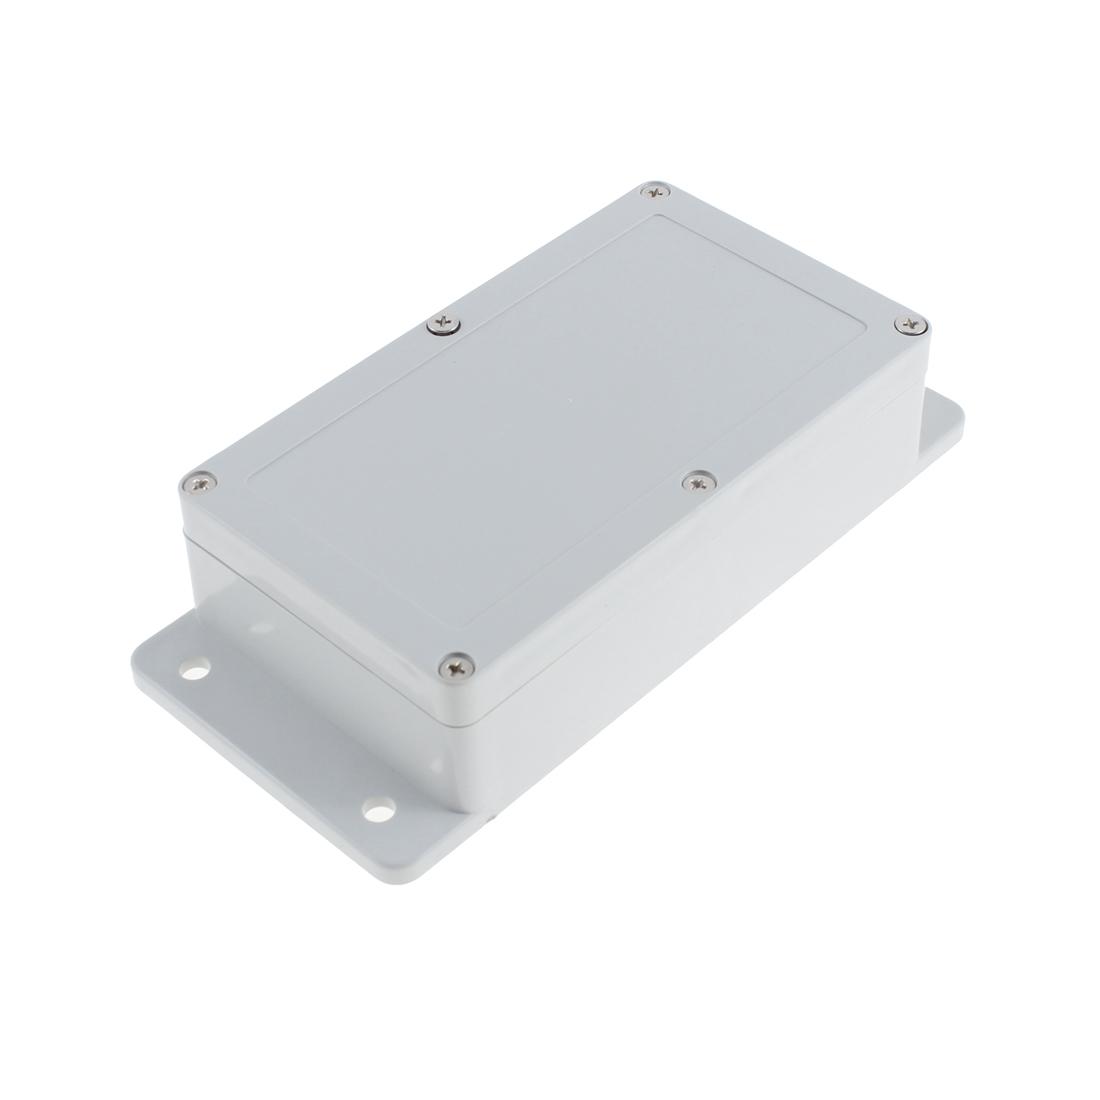 Splash Proof Gray Plastic Project Junction Box Case